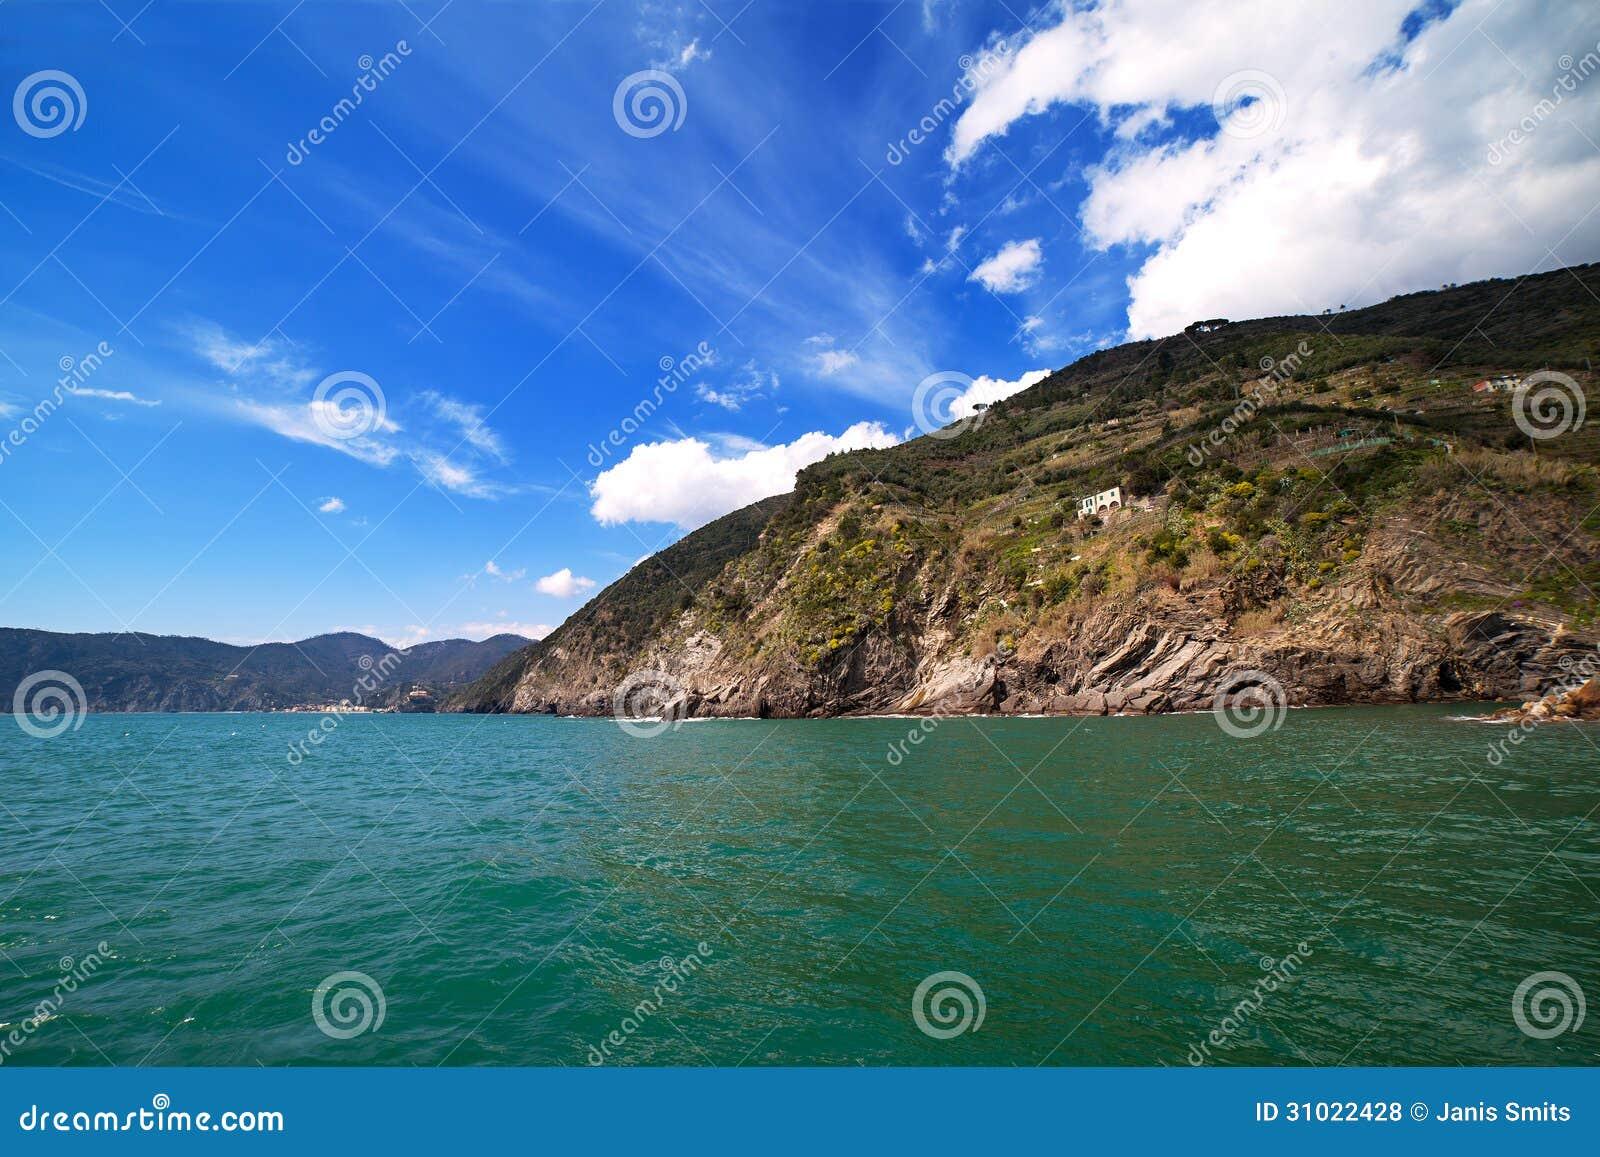 sea monterosso italy - photo #12